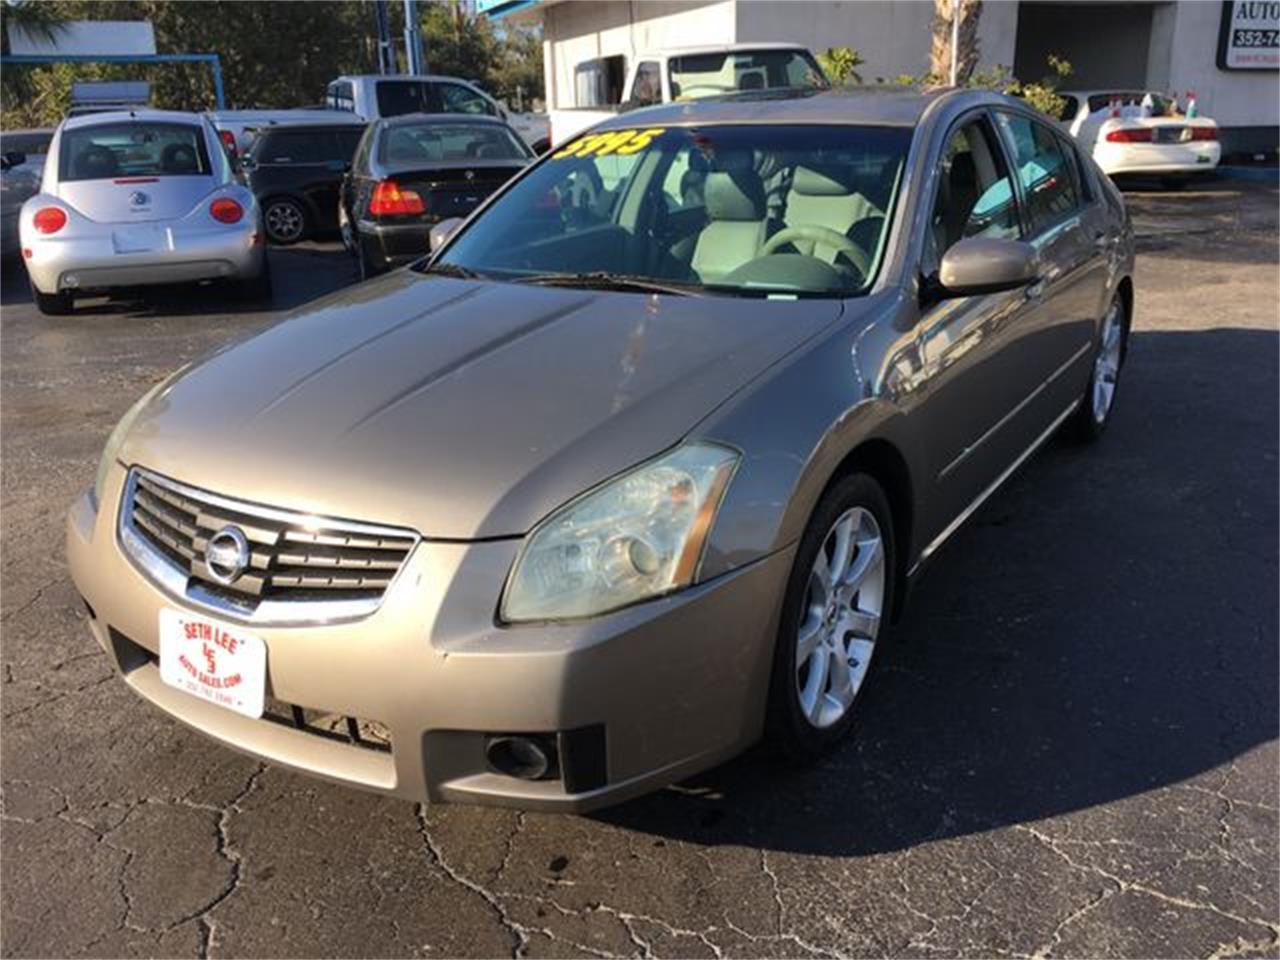 07 Nissan Maxima >> 2007 Nissan Maxima For Sale Classiccars Com Cc 1059081